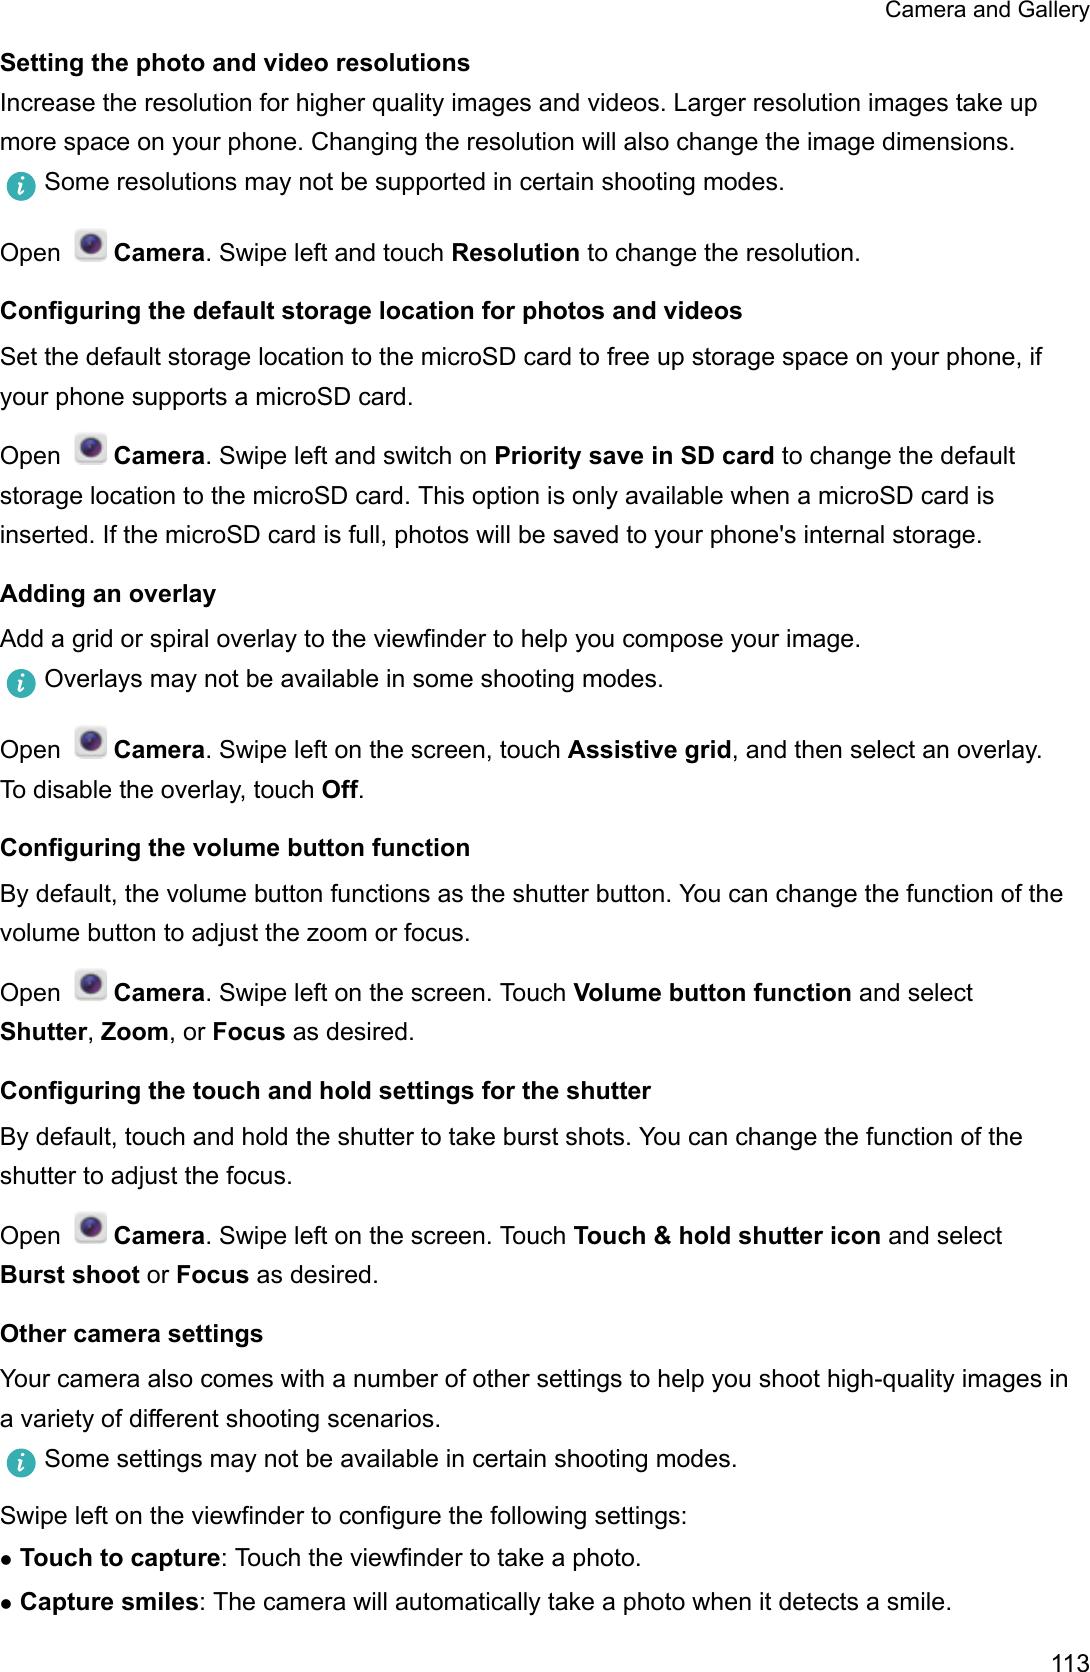 Huawei GR3 2017 User Guide (PRA LA1, 01, English